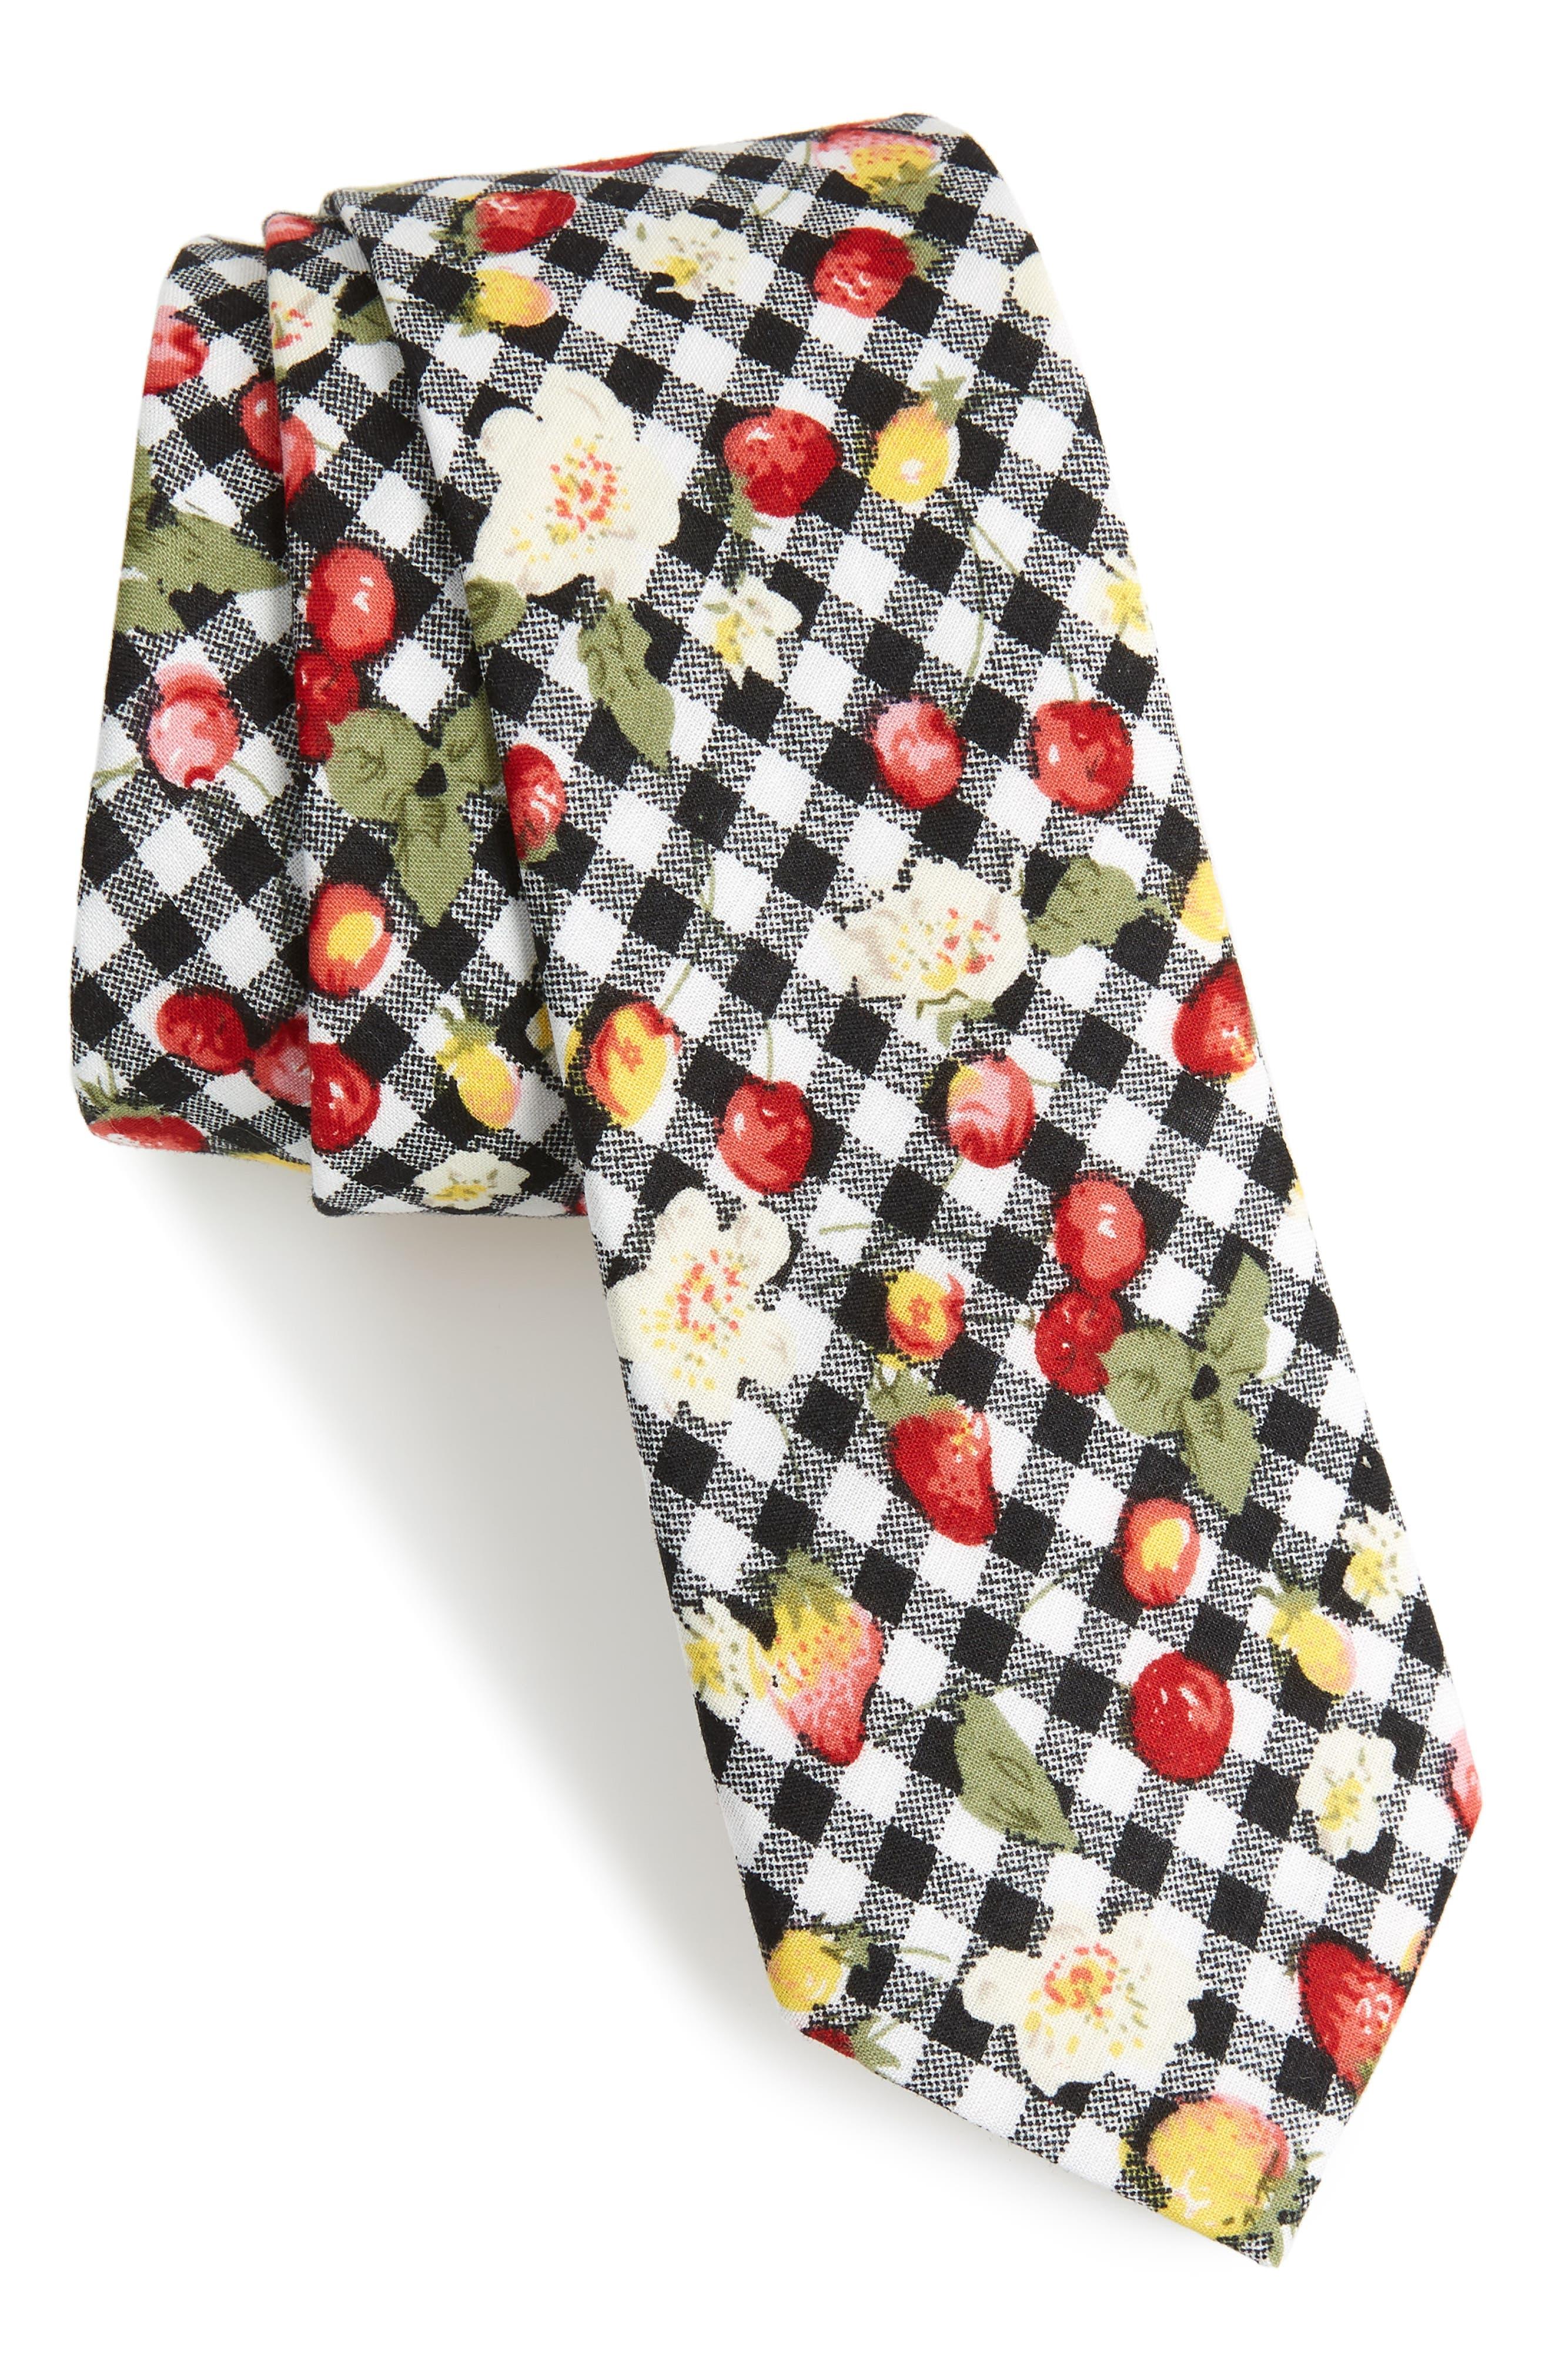 Alternate Image 1 Selected - Nordstrom Men's Shop Edmond Floral & Check Cotton Skinny Tie